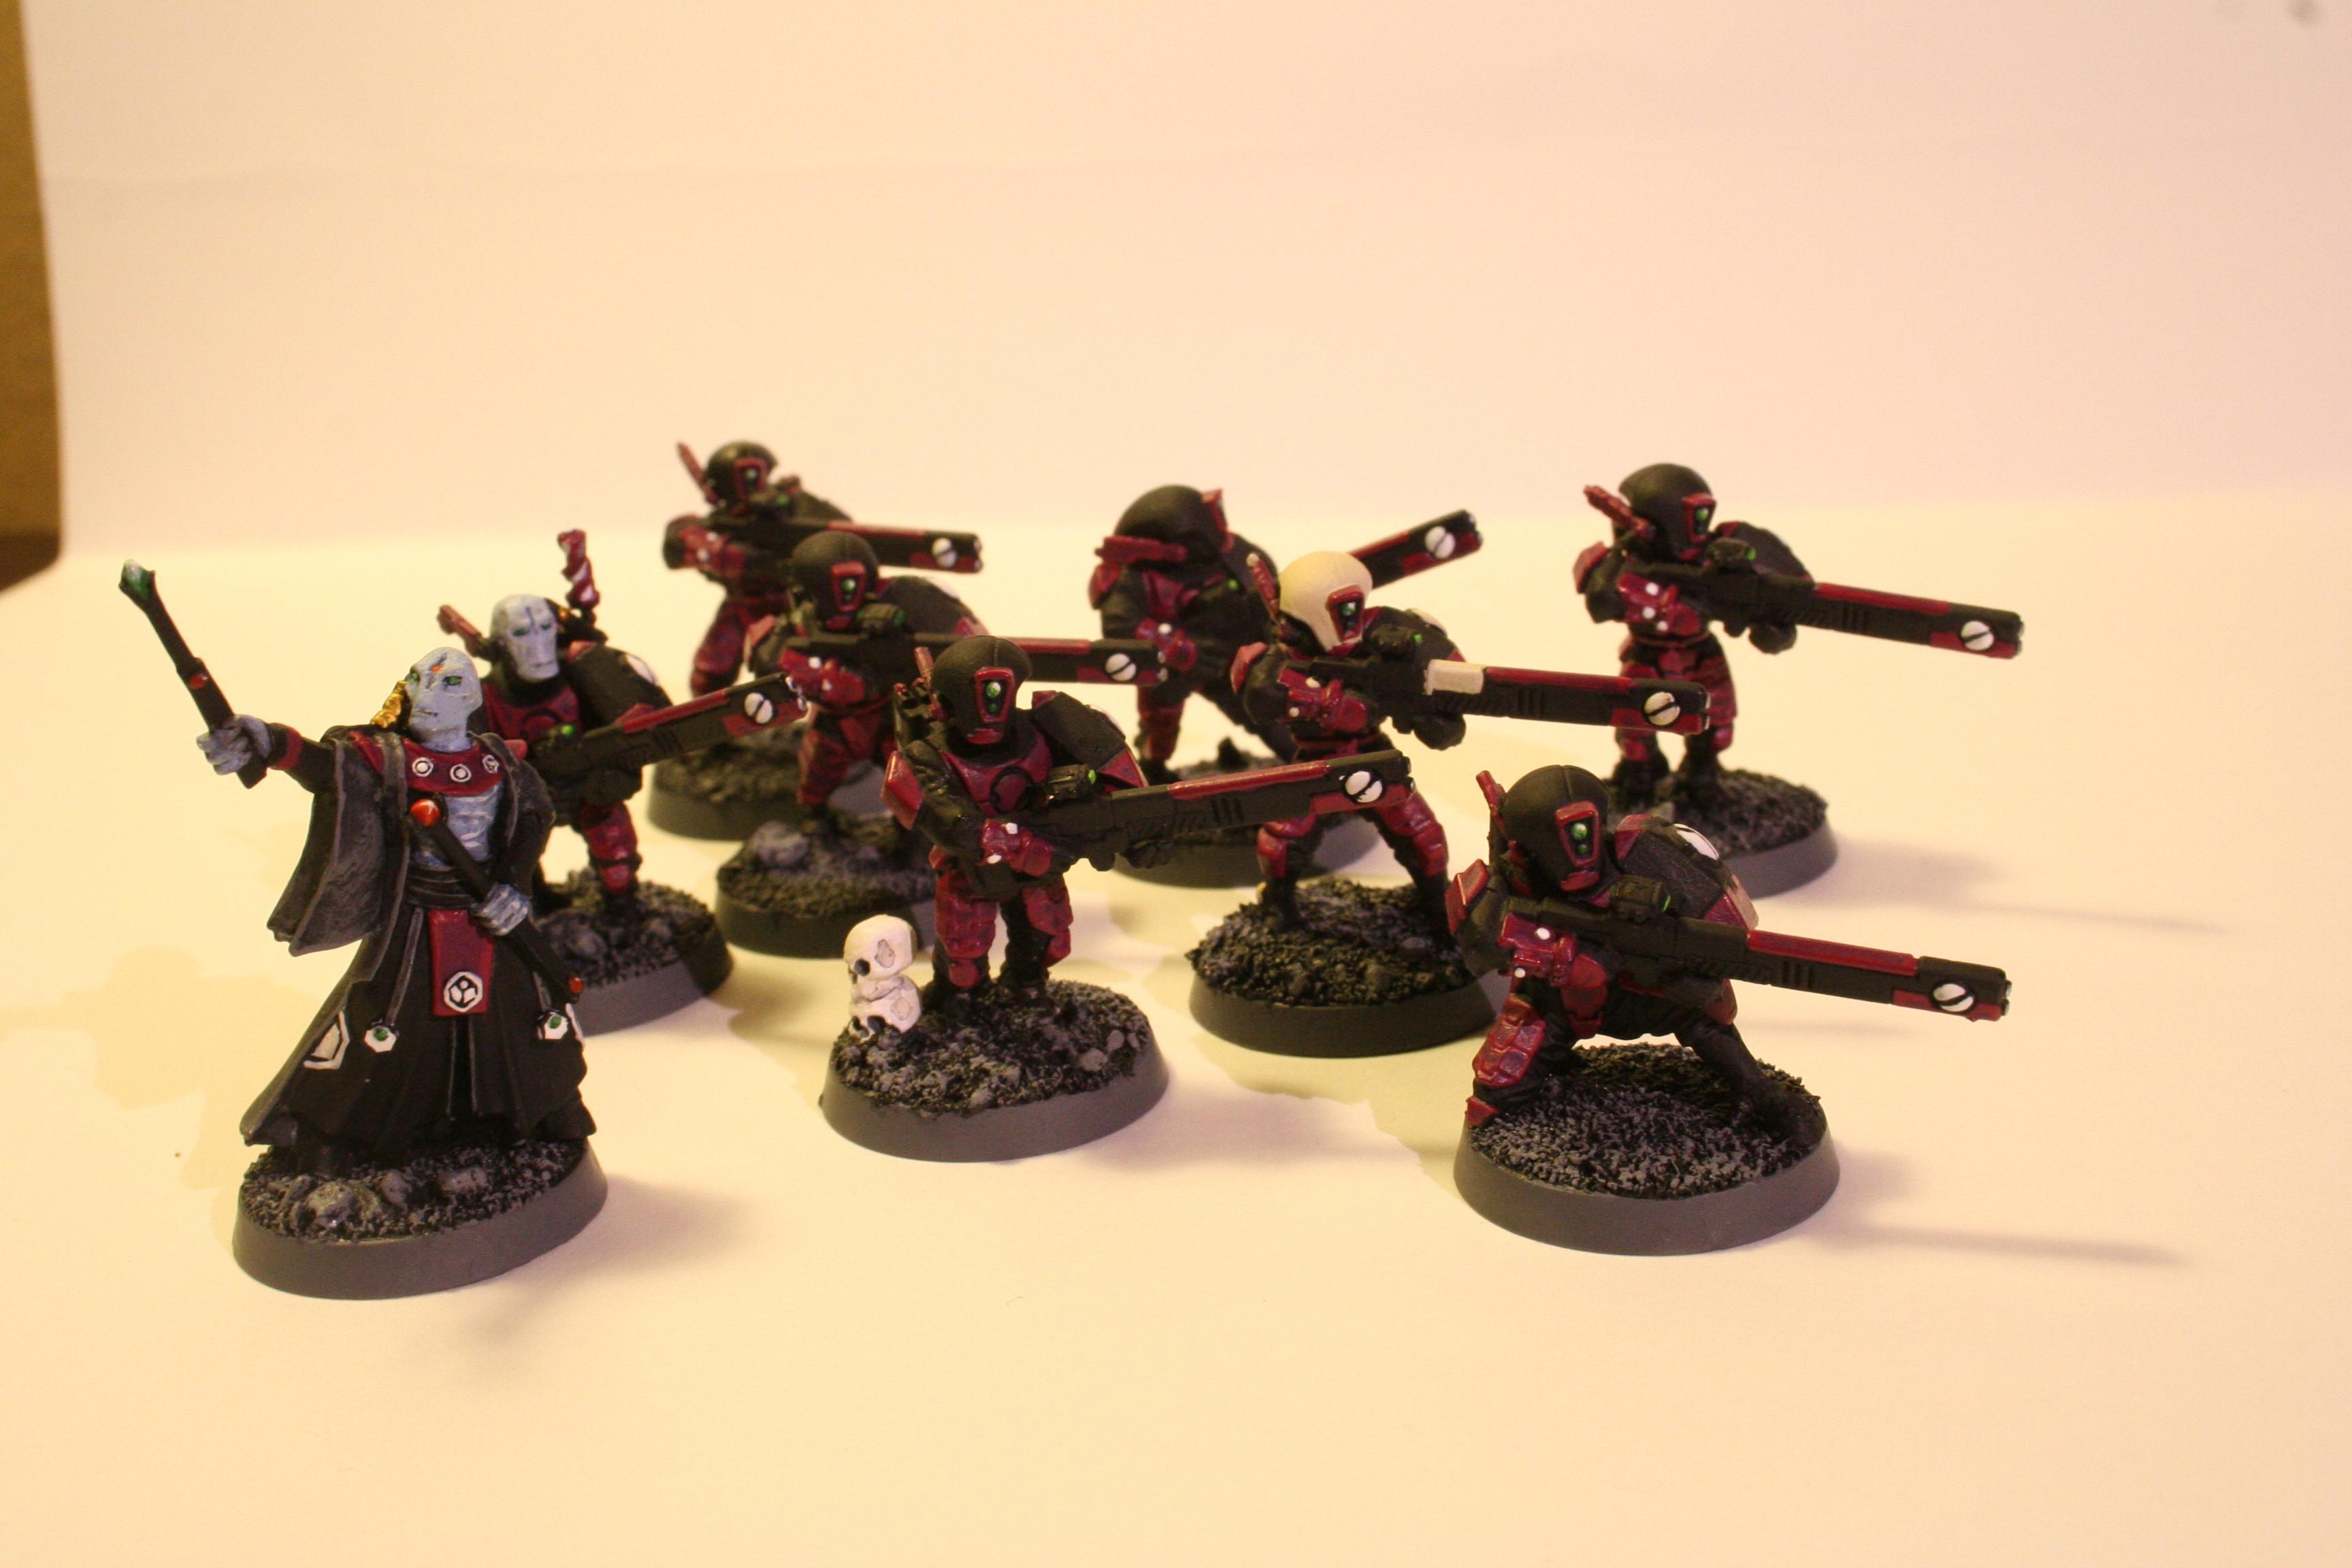 Brush, Cadre, Ethereal, Fire Warriors, Perils, Tau, Warhammer 40,000